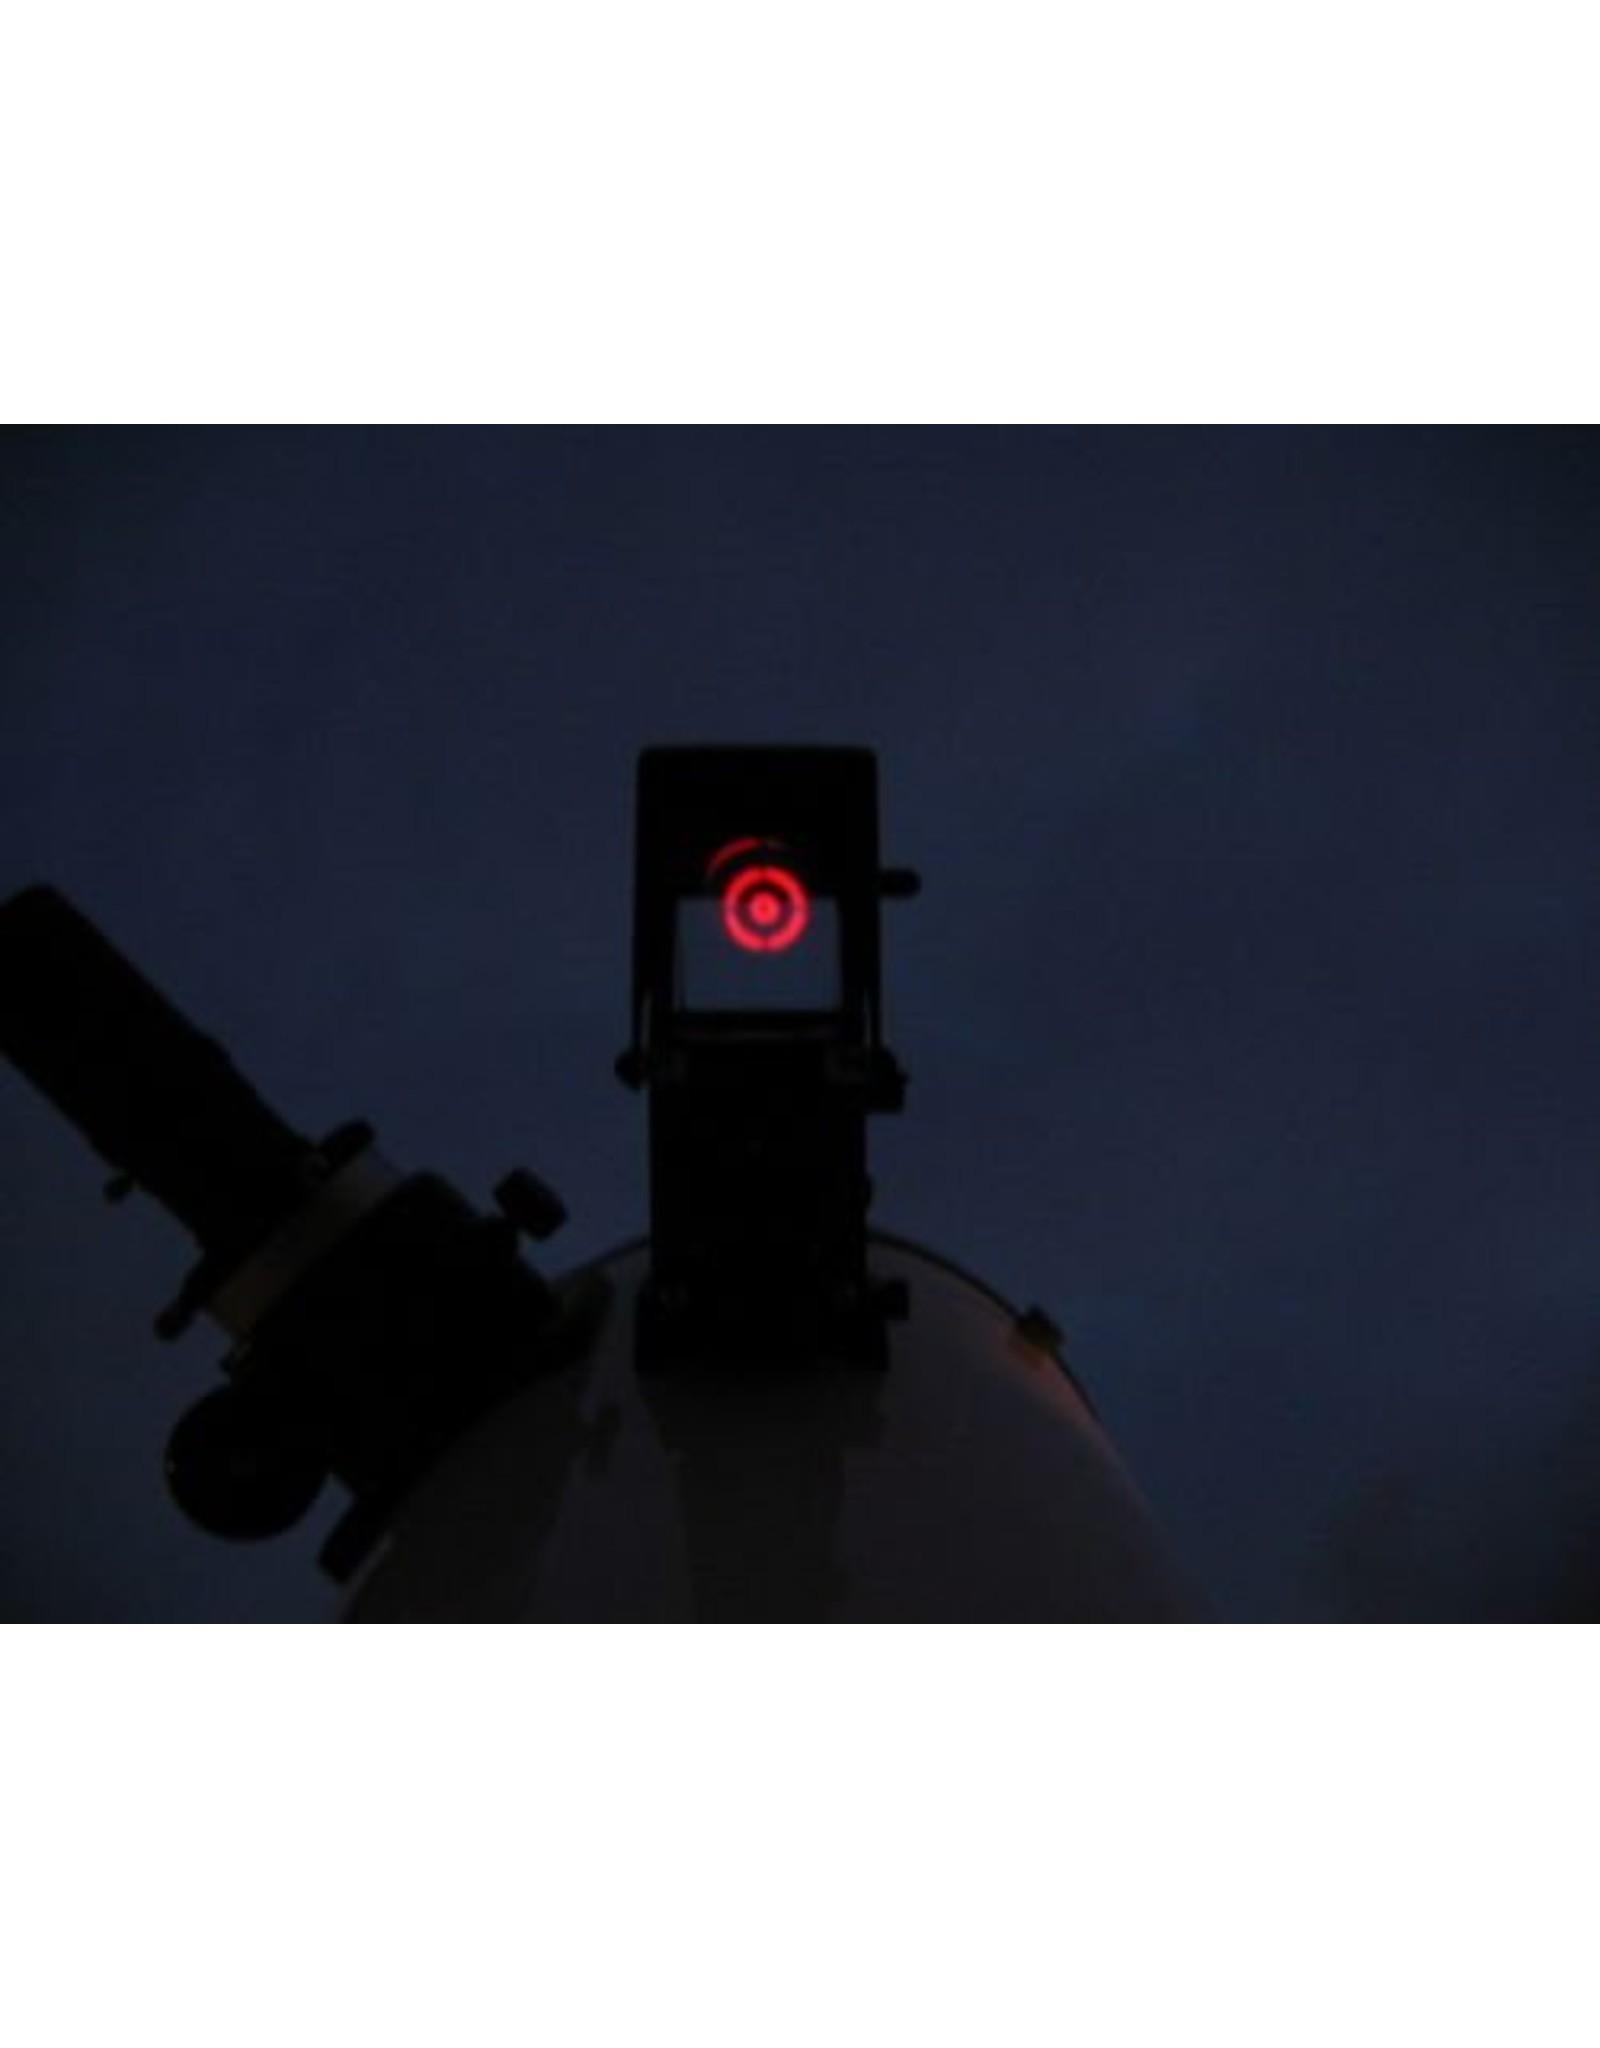 Telrad Telrad Illuminated Red Bulls-Eye Finderscope